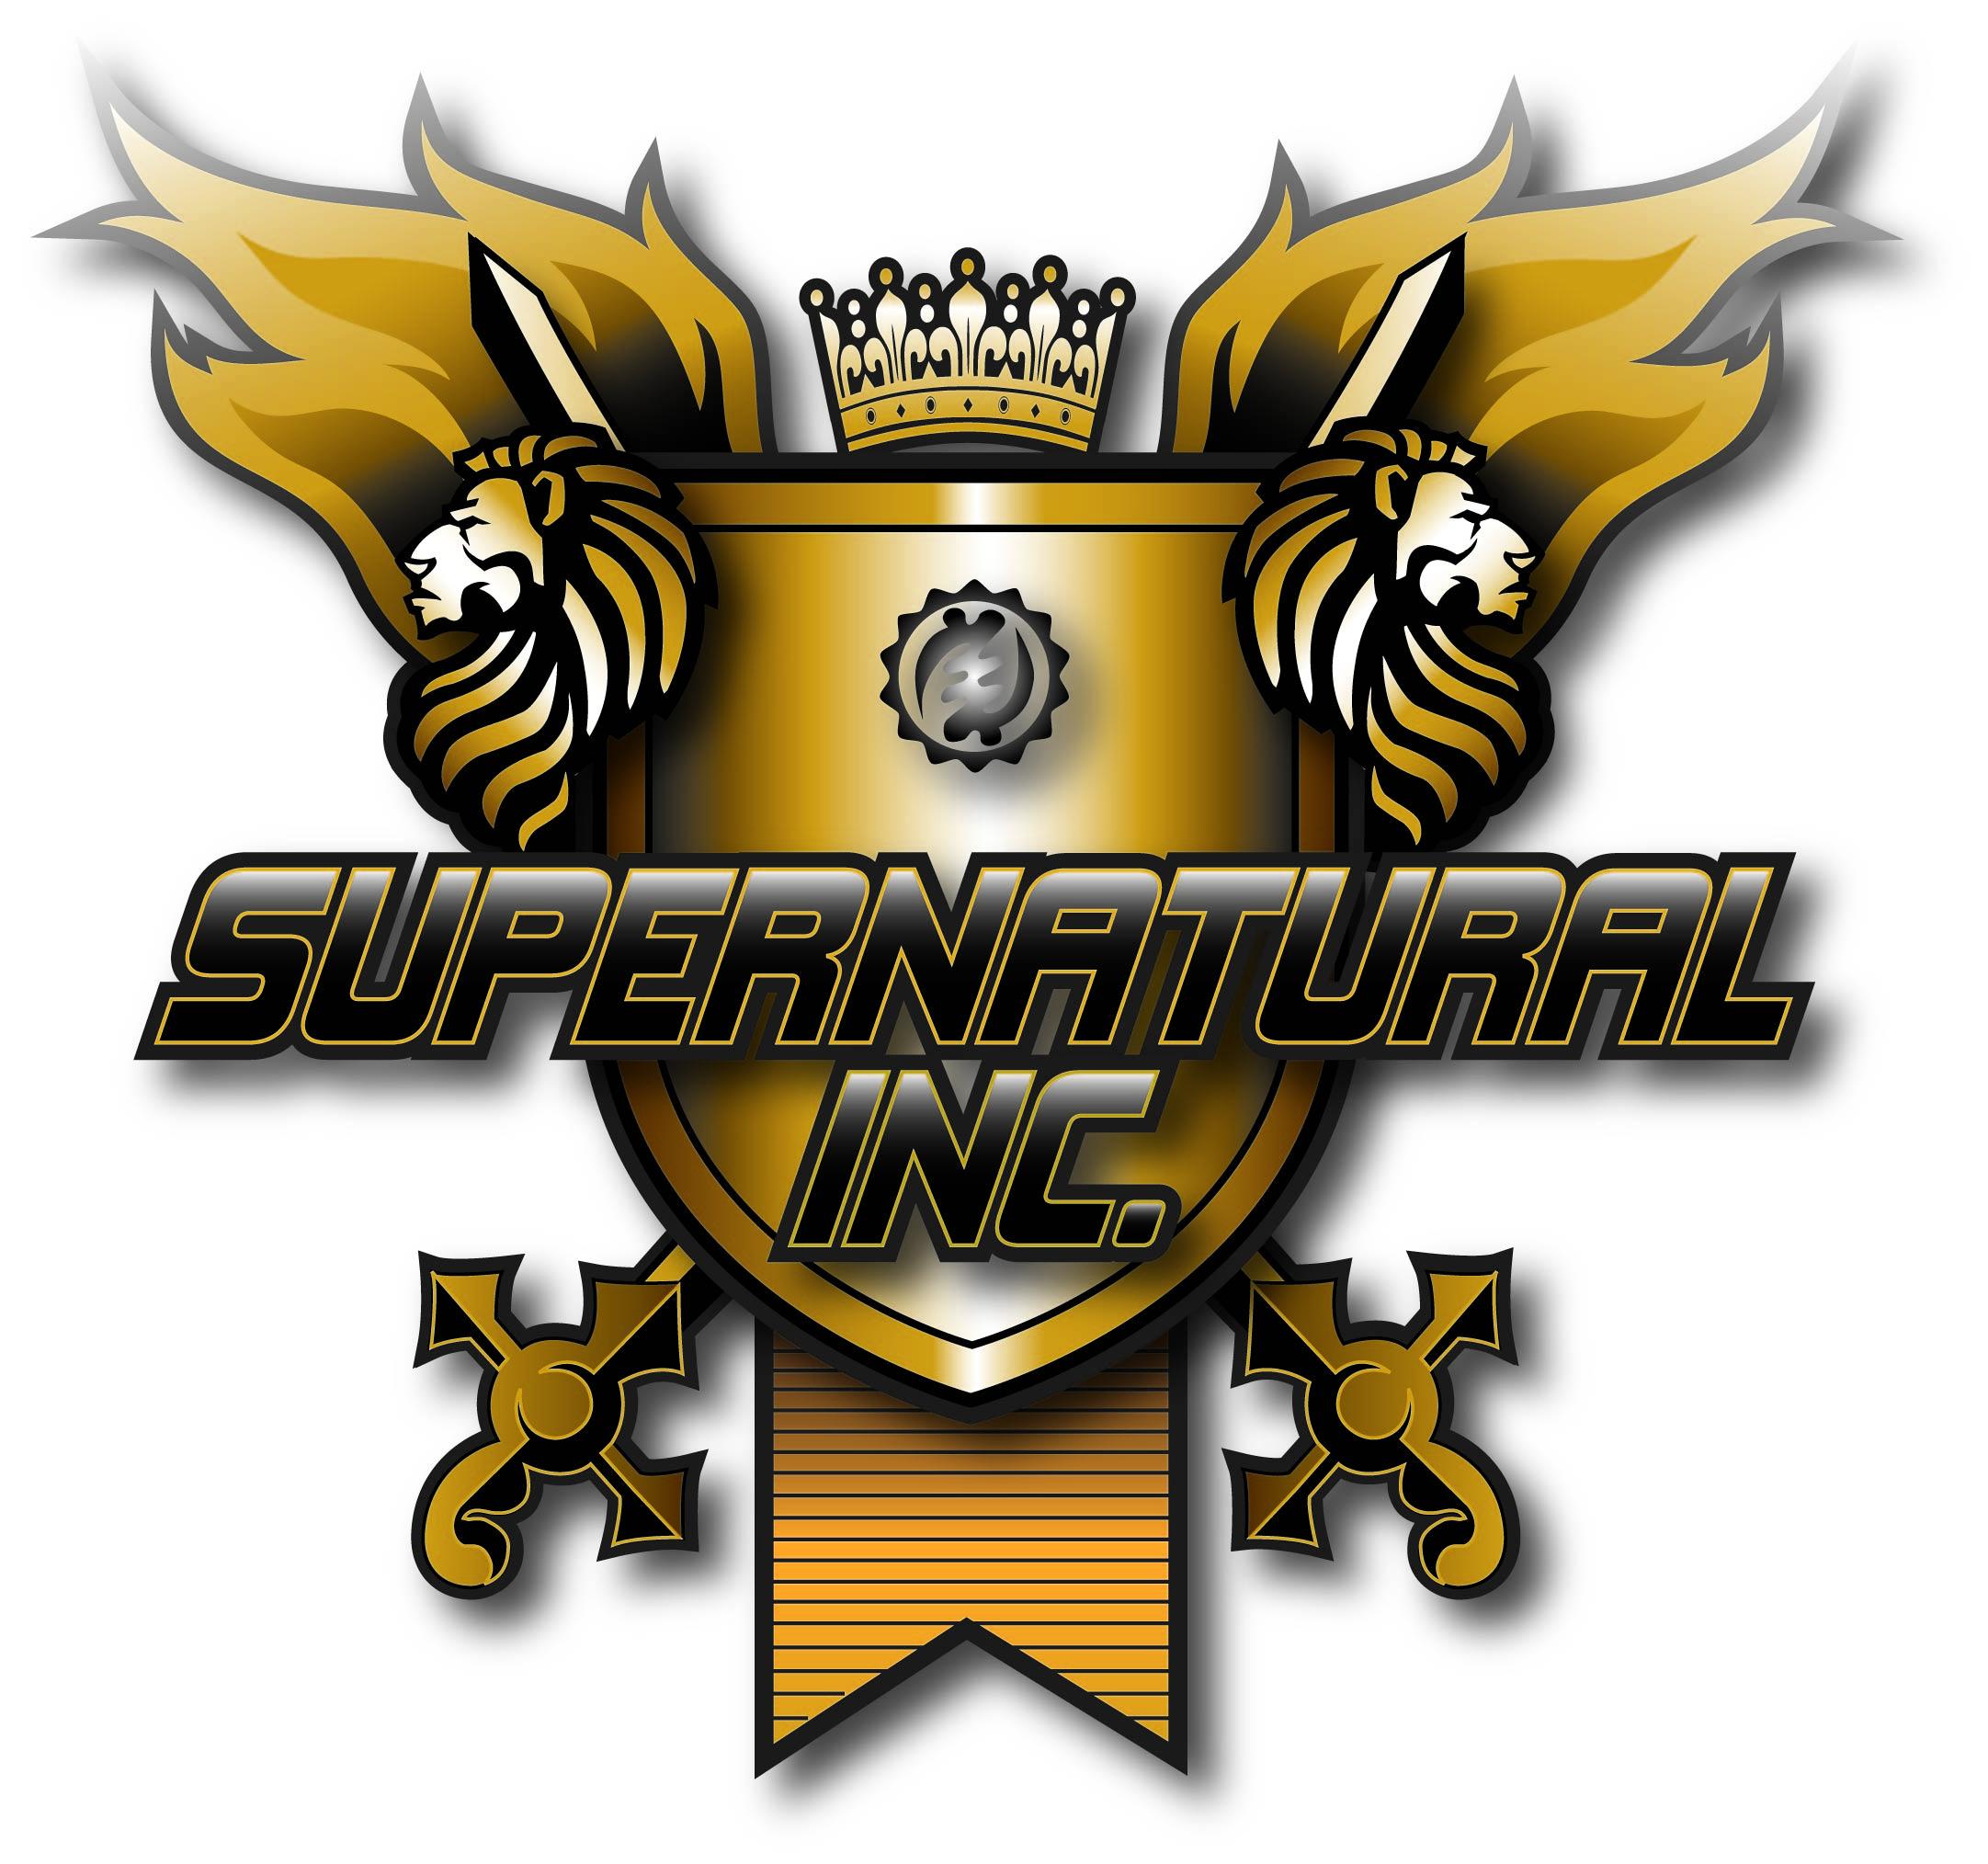 SUPERNATURAL INC MUSIC GROUP